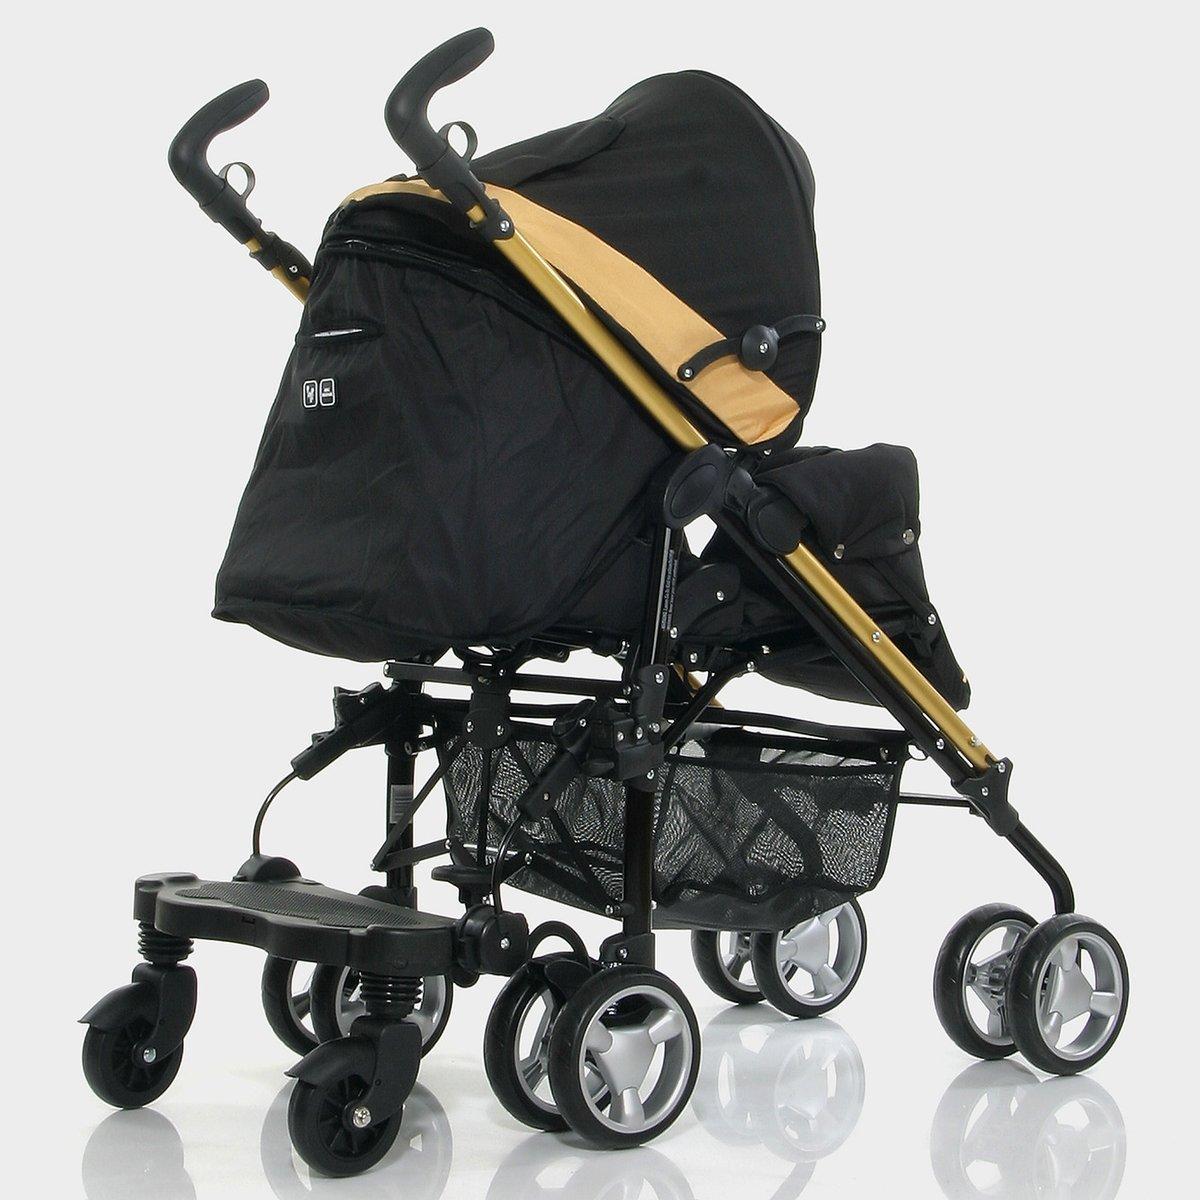 Black ABC Design Kiddie Ride-on Board